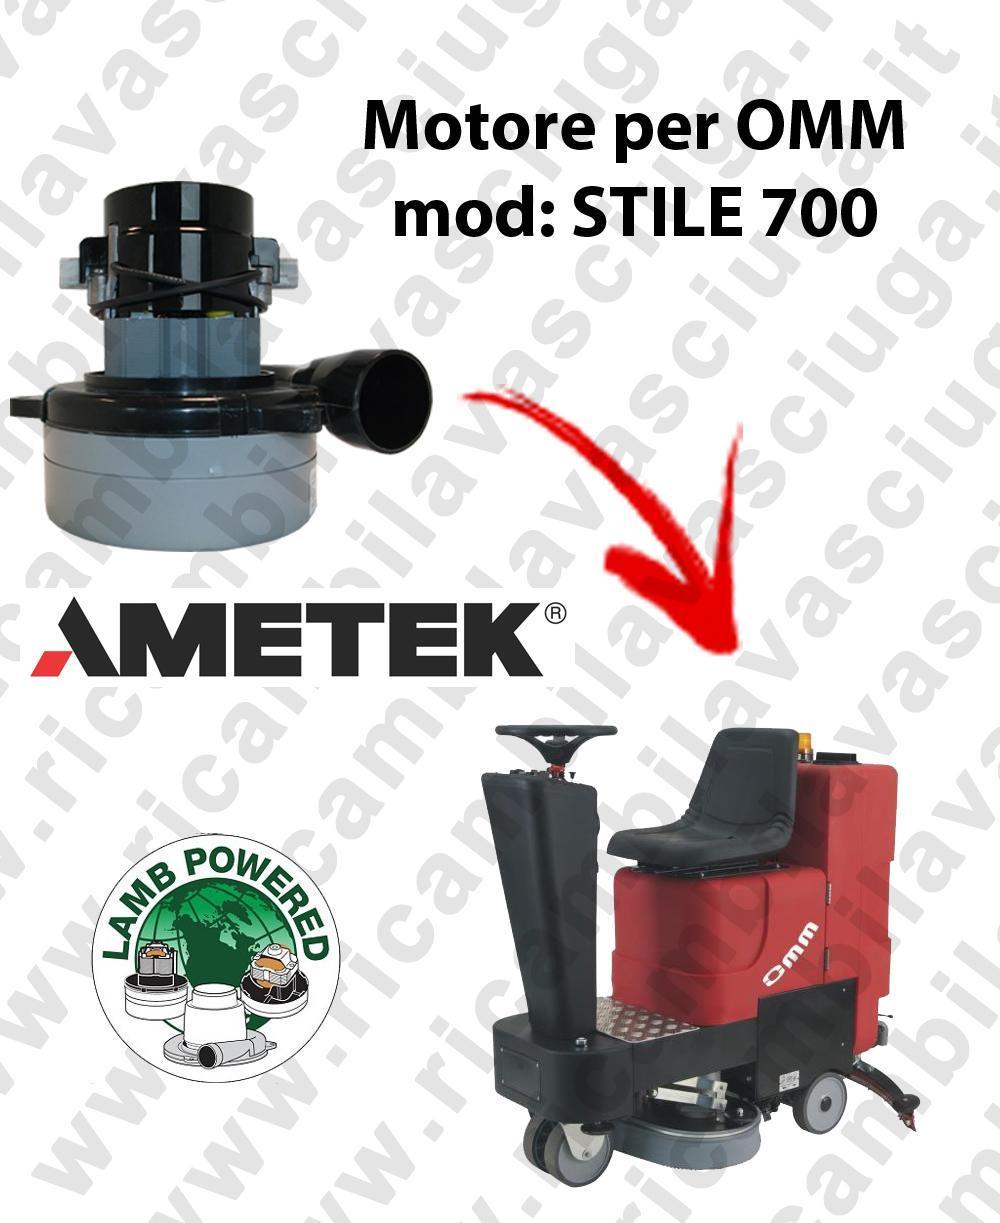 STILE 700 Motore de aspiración LAMB AMETEK para fregadora OMM